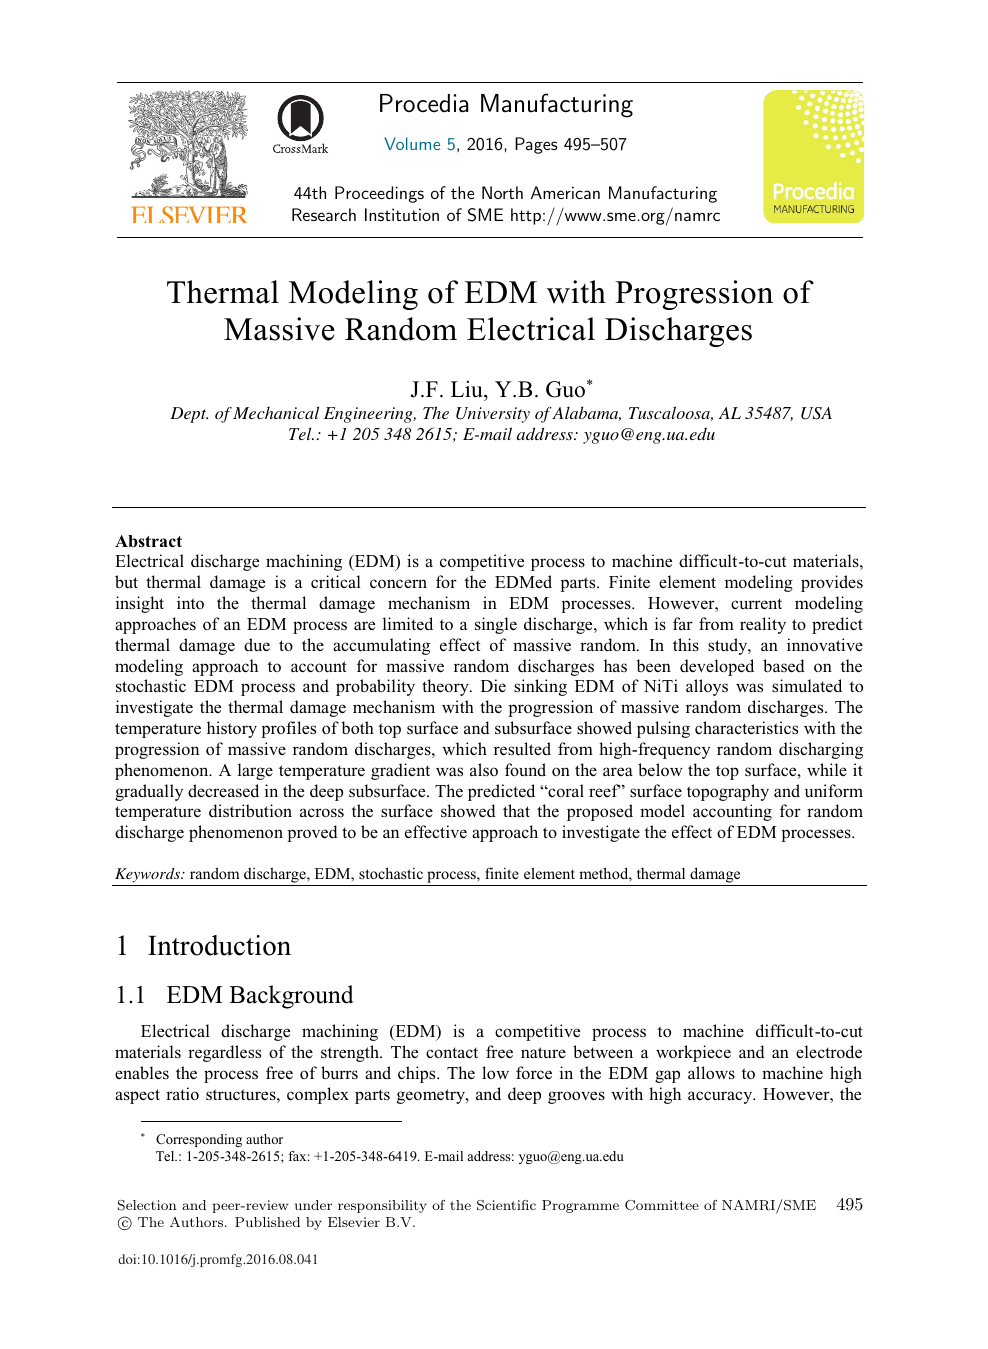 Thermal Modeling of EDM with Progression of Massive Random